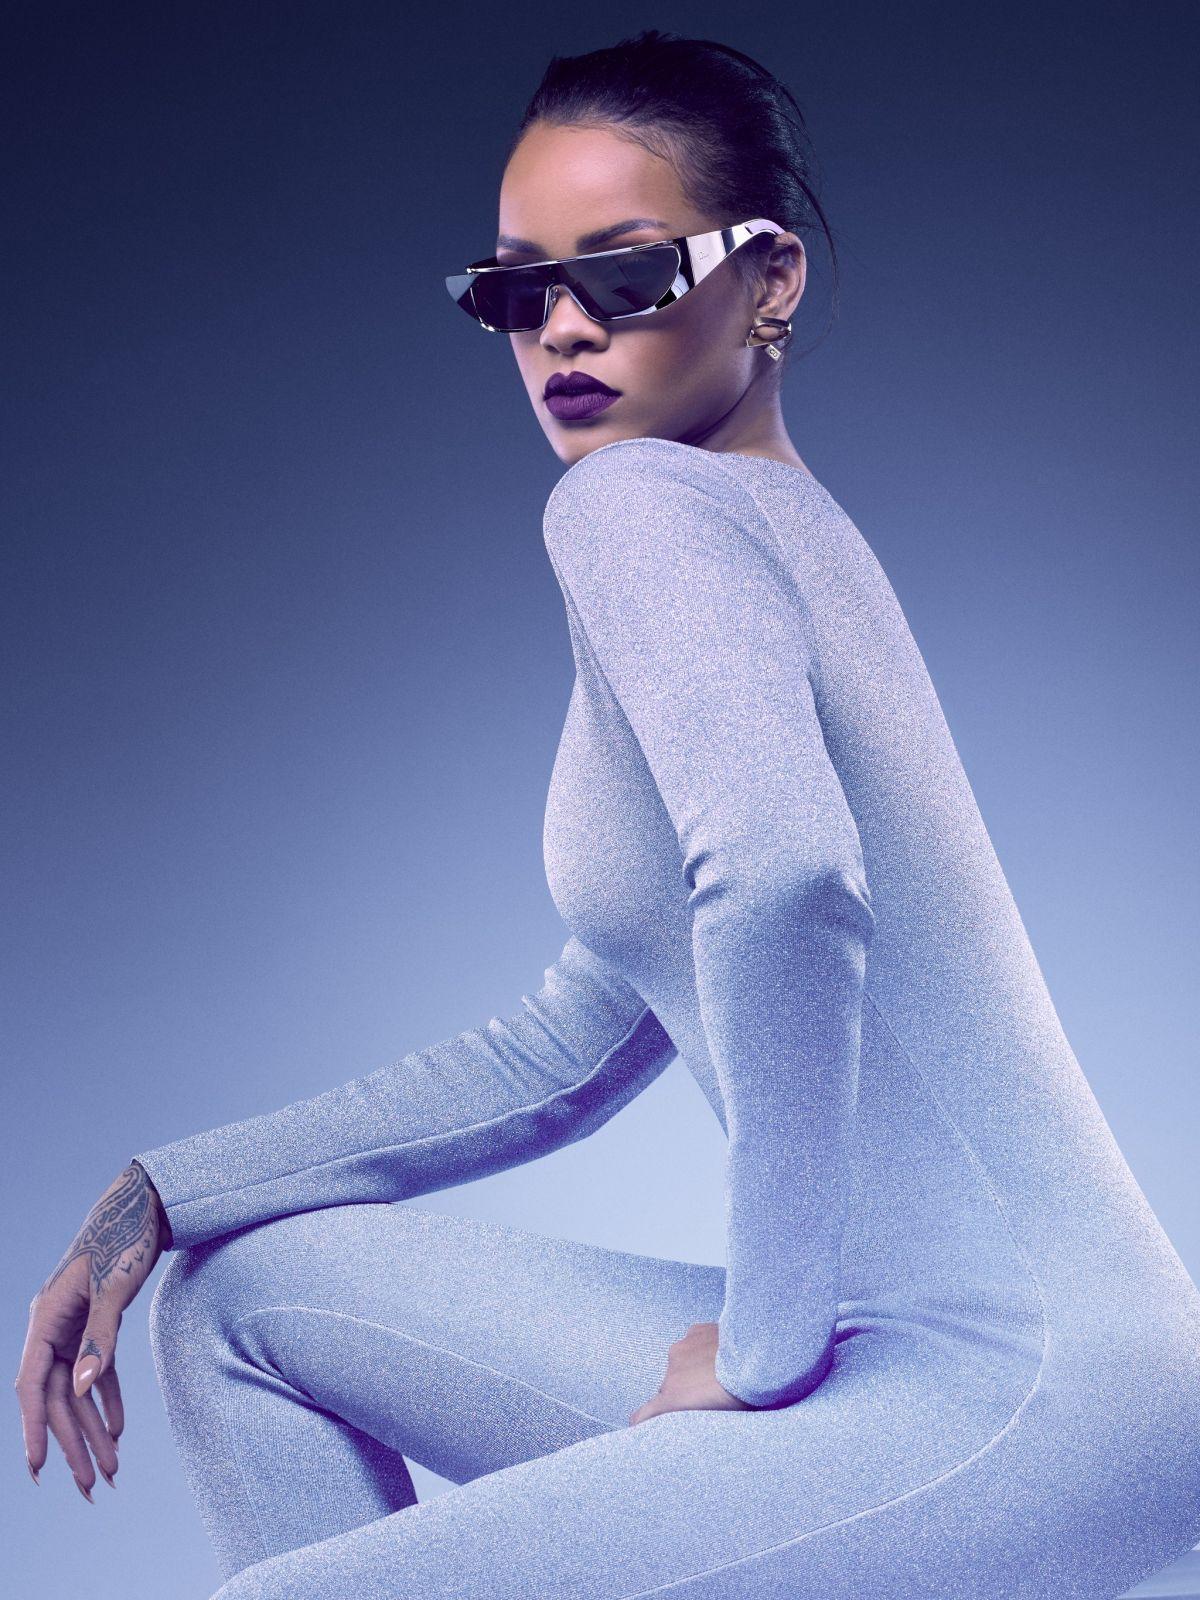 Dior Eyeglass Frames 2016 : RIHANNA for Christian Dior & Rihanna Eyewear 2016 ...